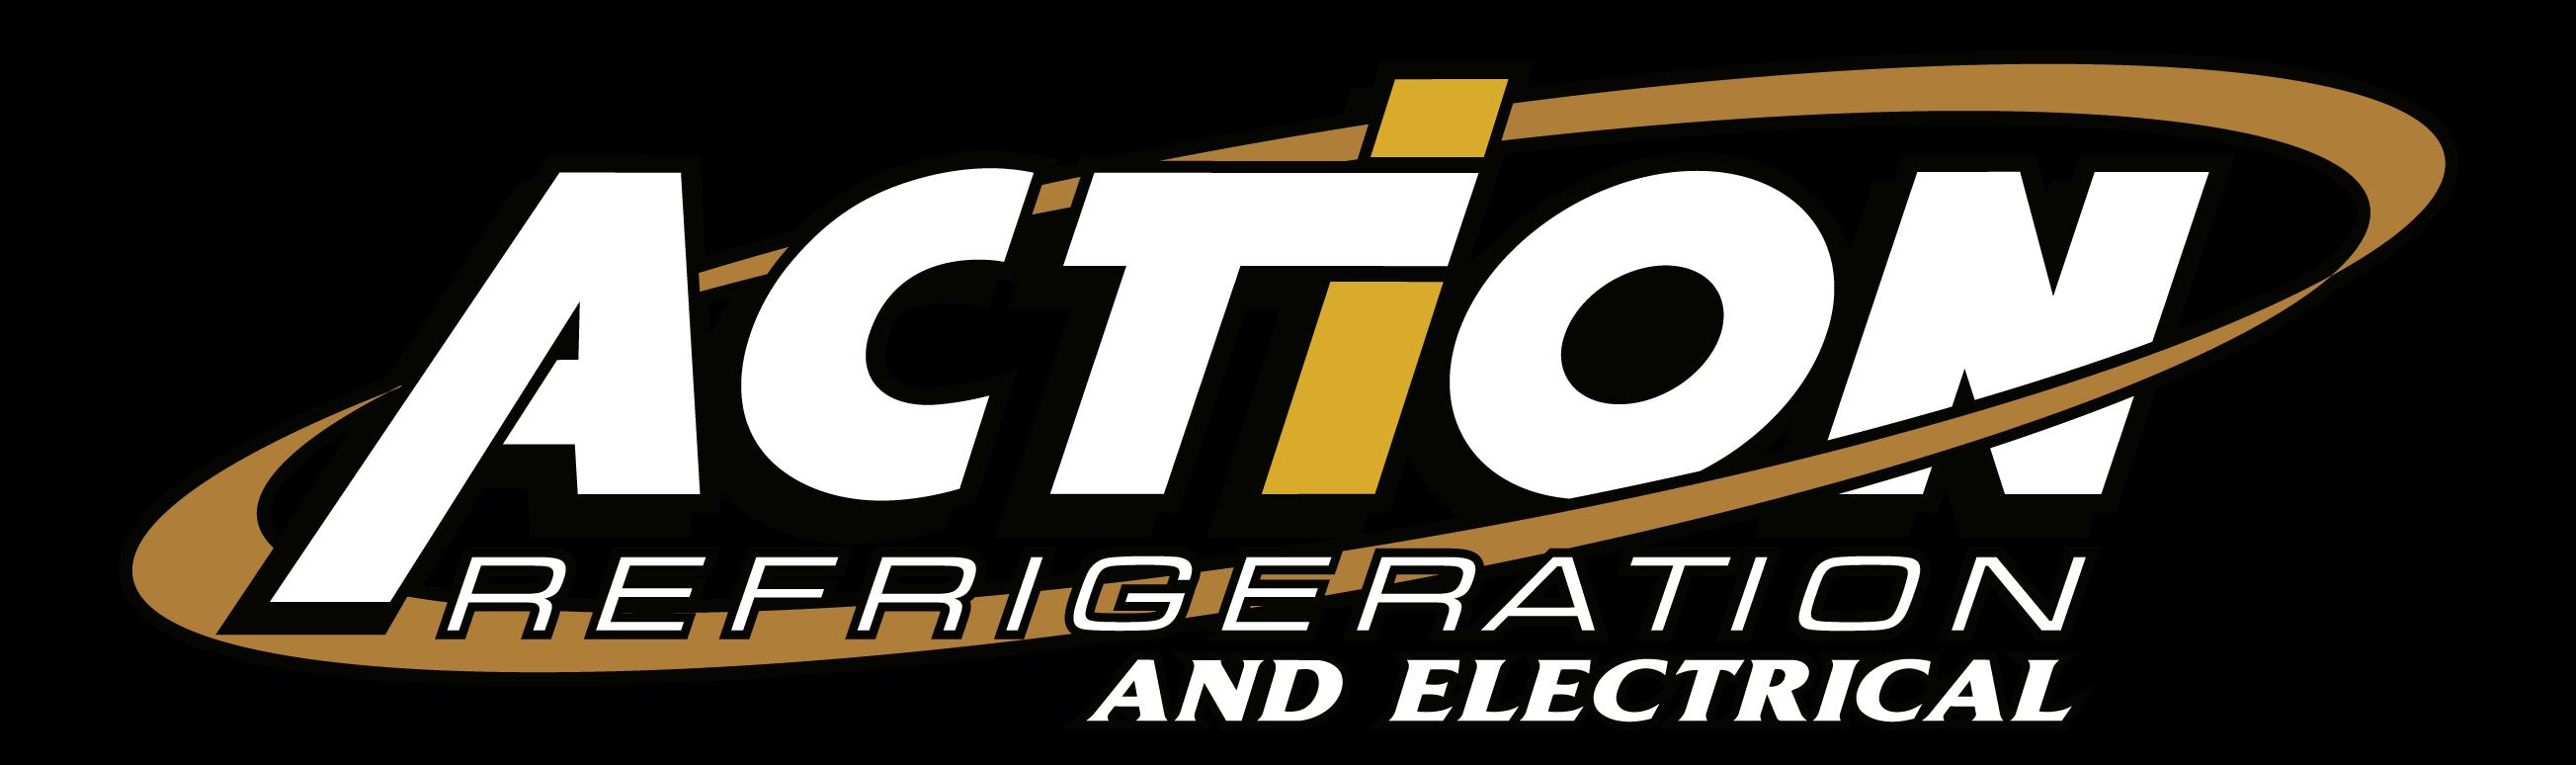 Action Refrigeration Mechanical & Electrical logo